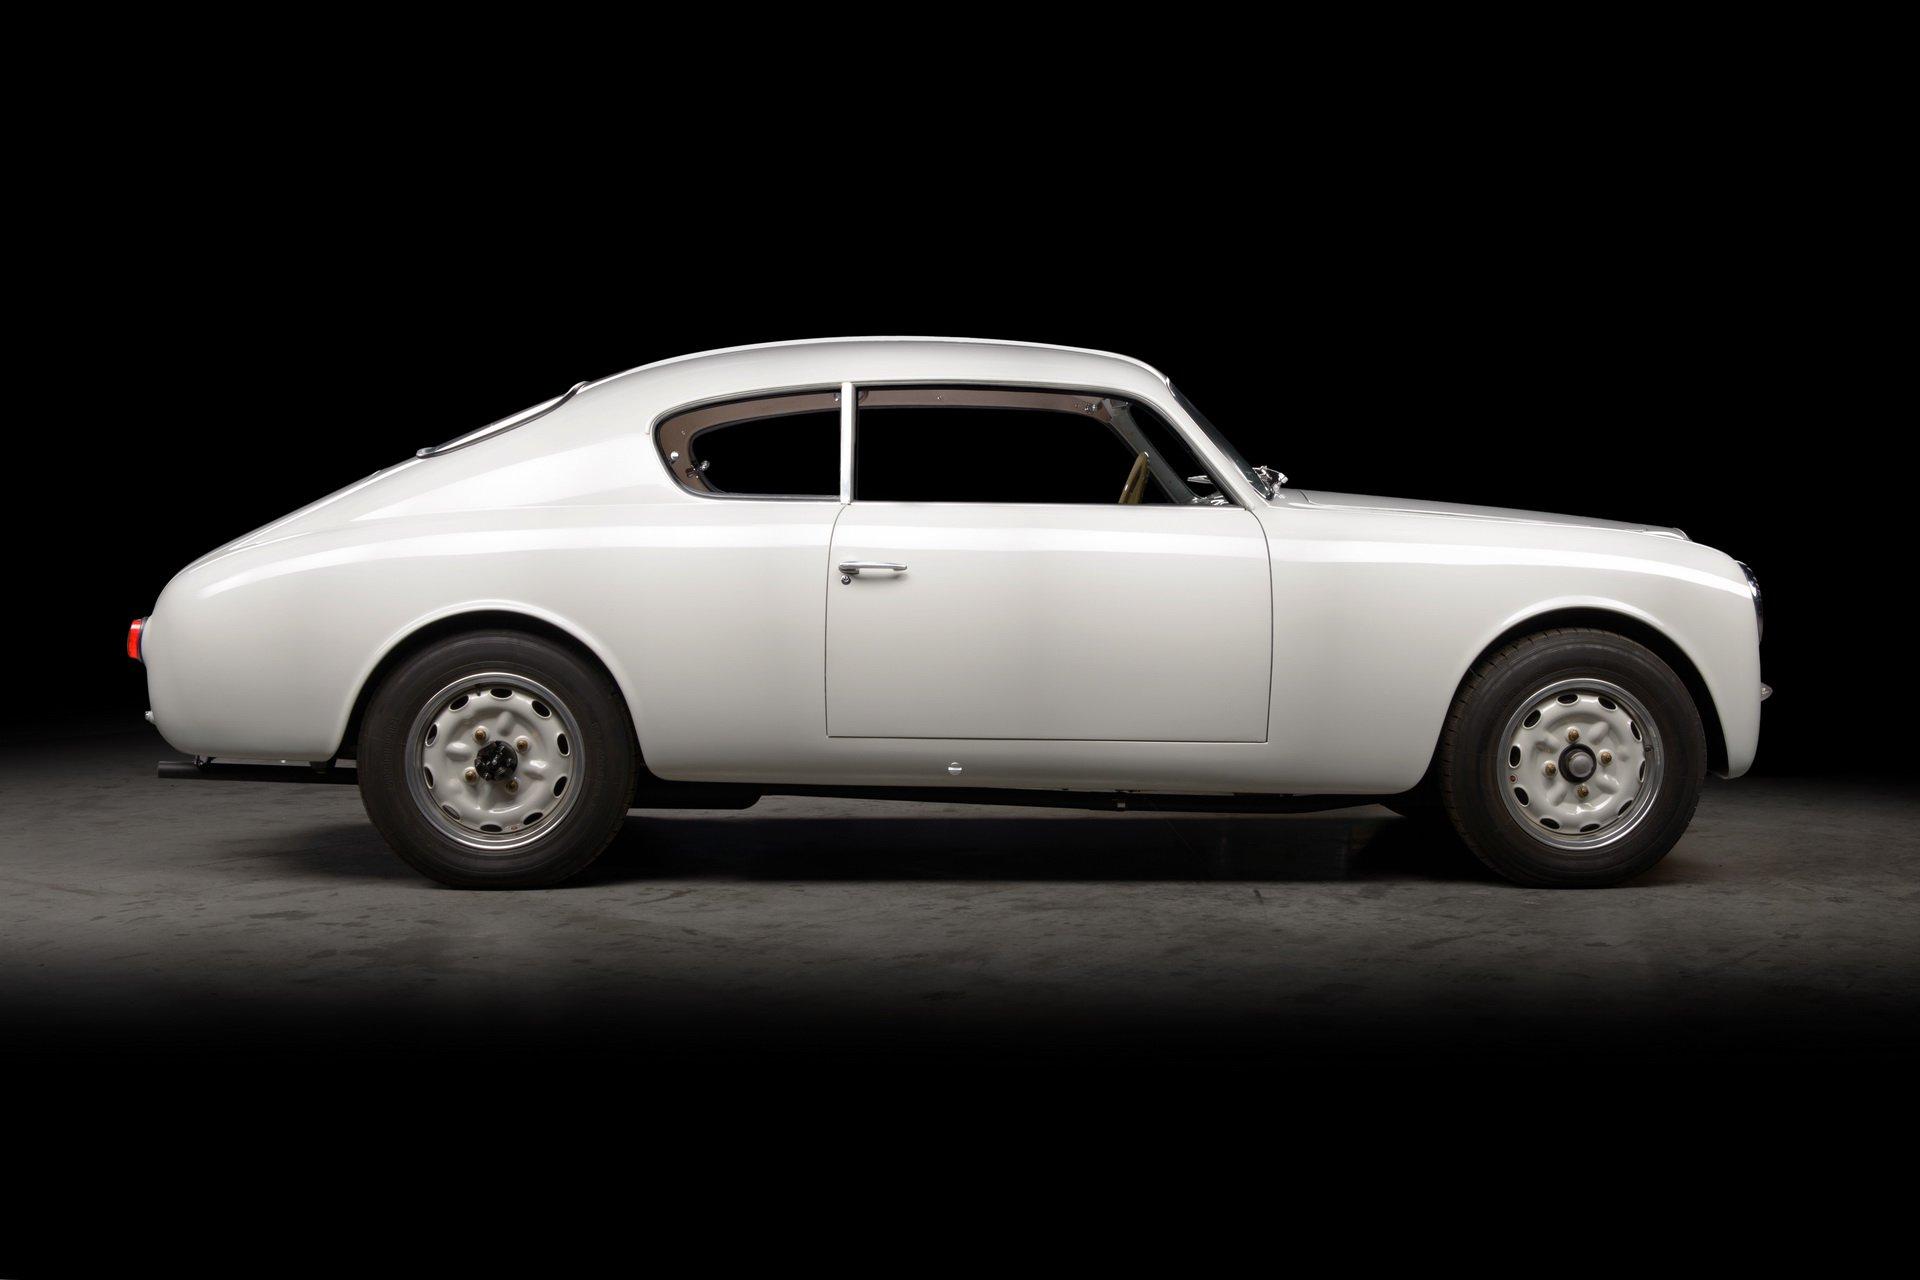 Lancia-Aurelia-B20-GT-restored-15